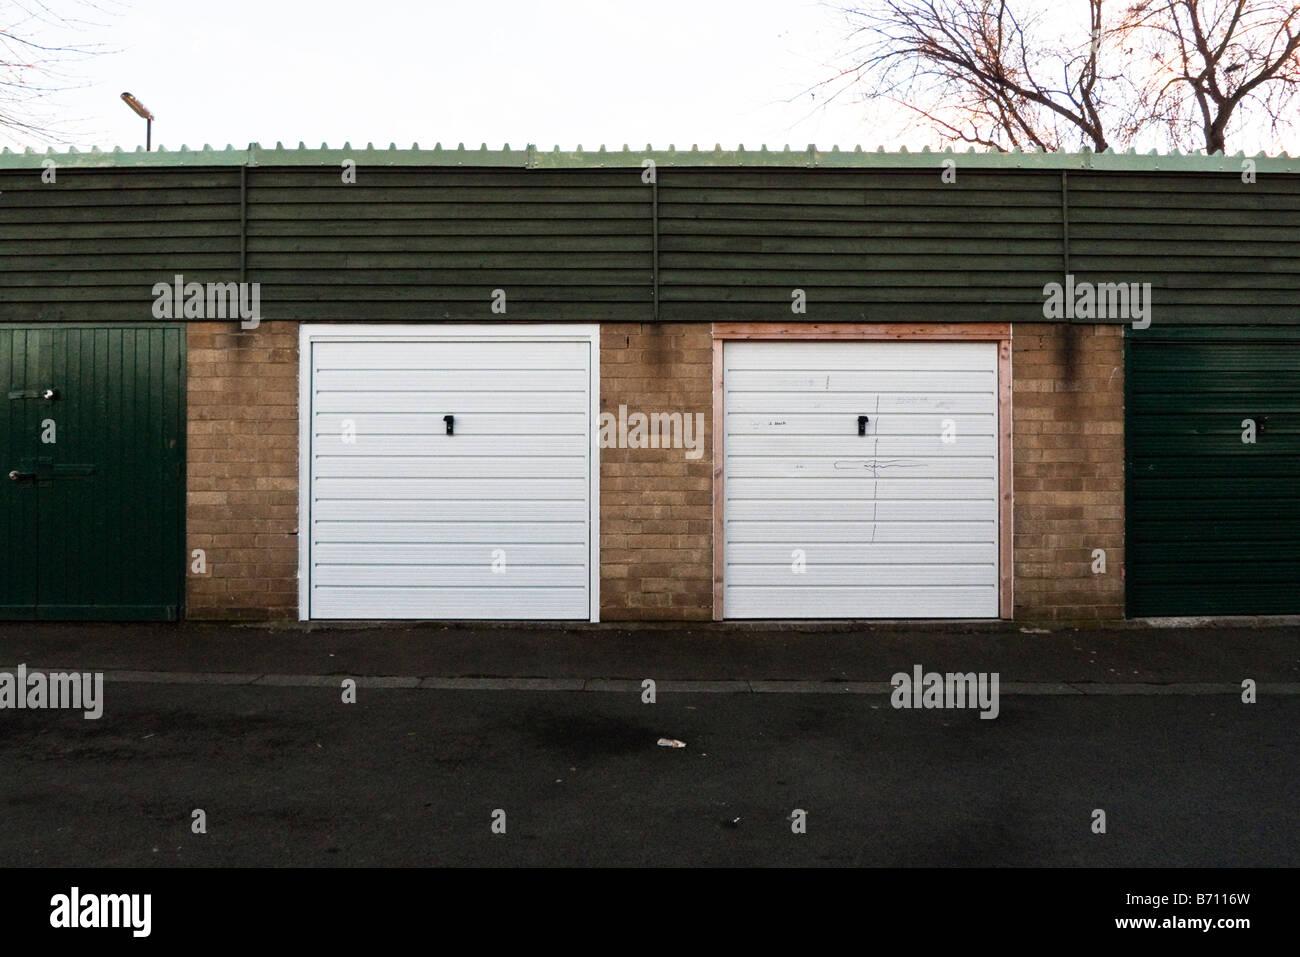 Two Garage Doors In Newcastle Upon Tyne Stock Photo 21535889 Alamy